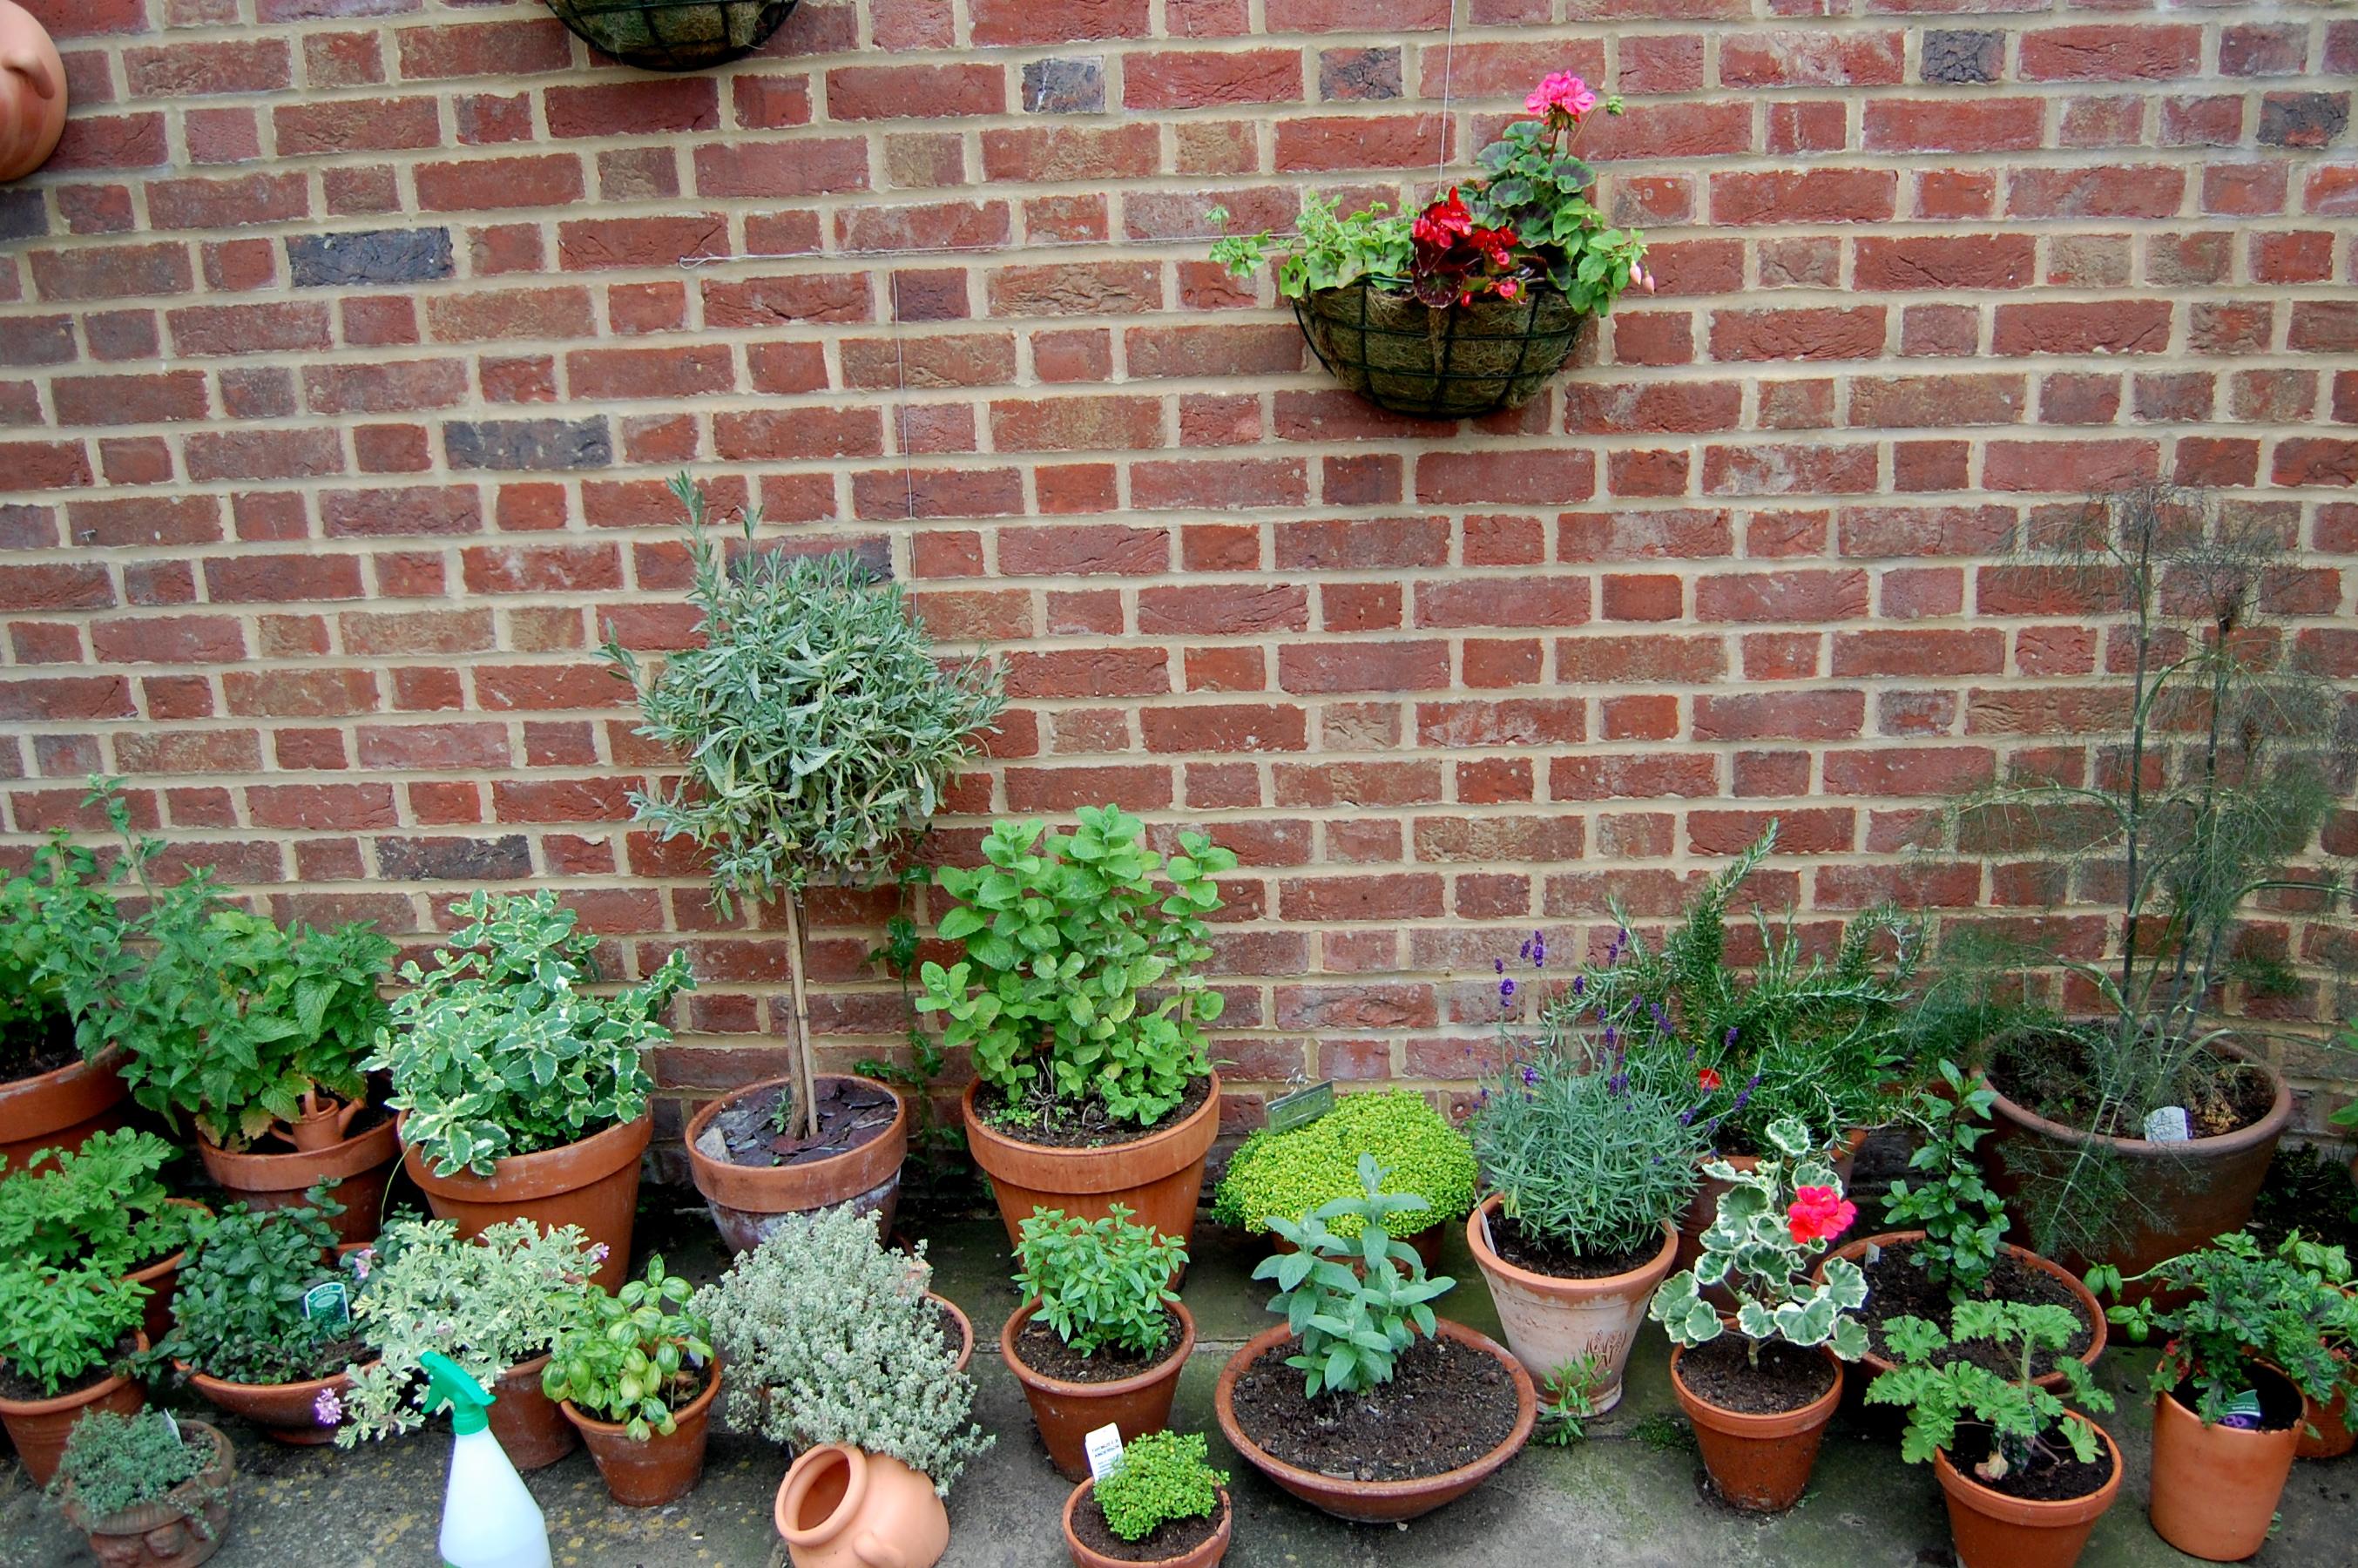 More of the herb garden